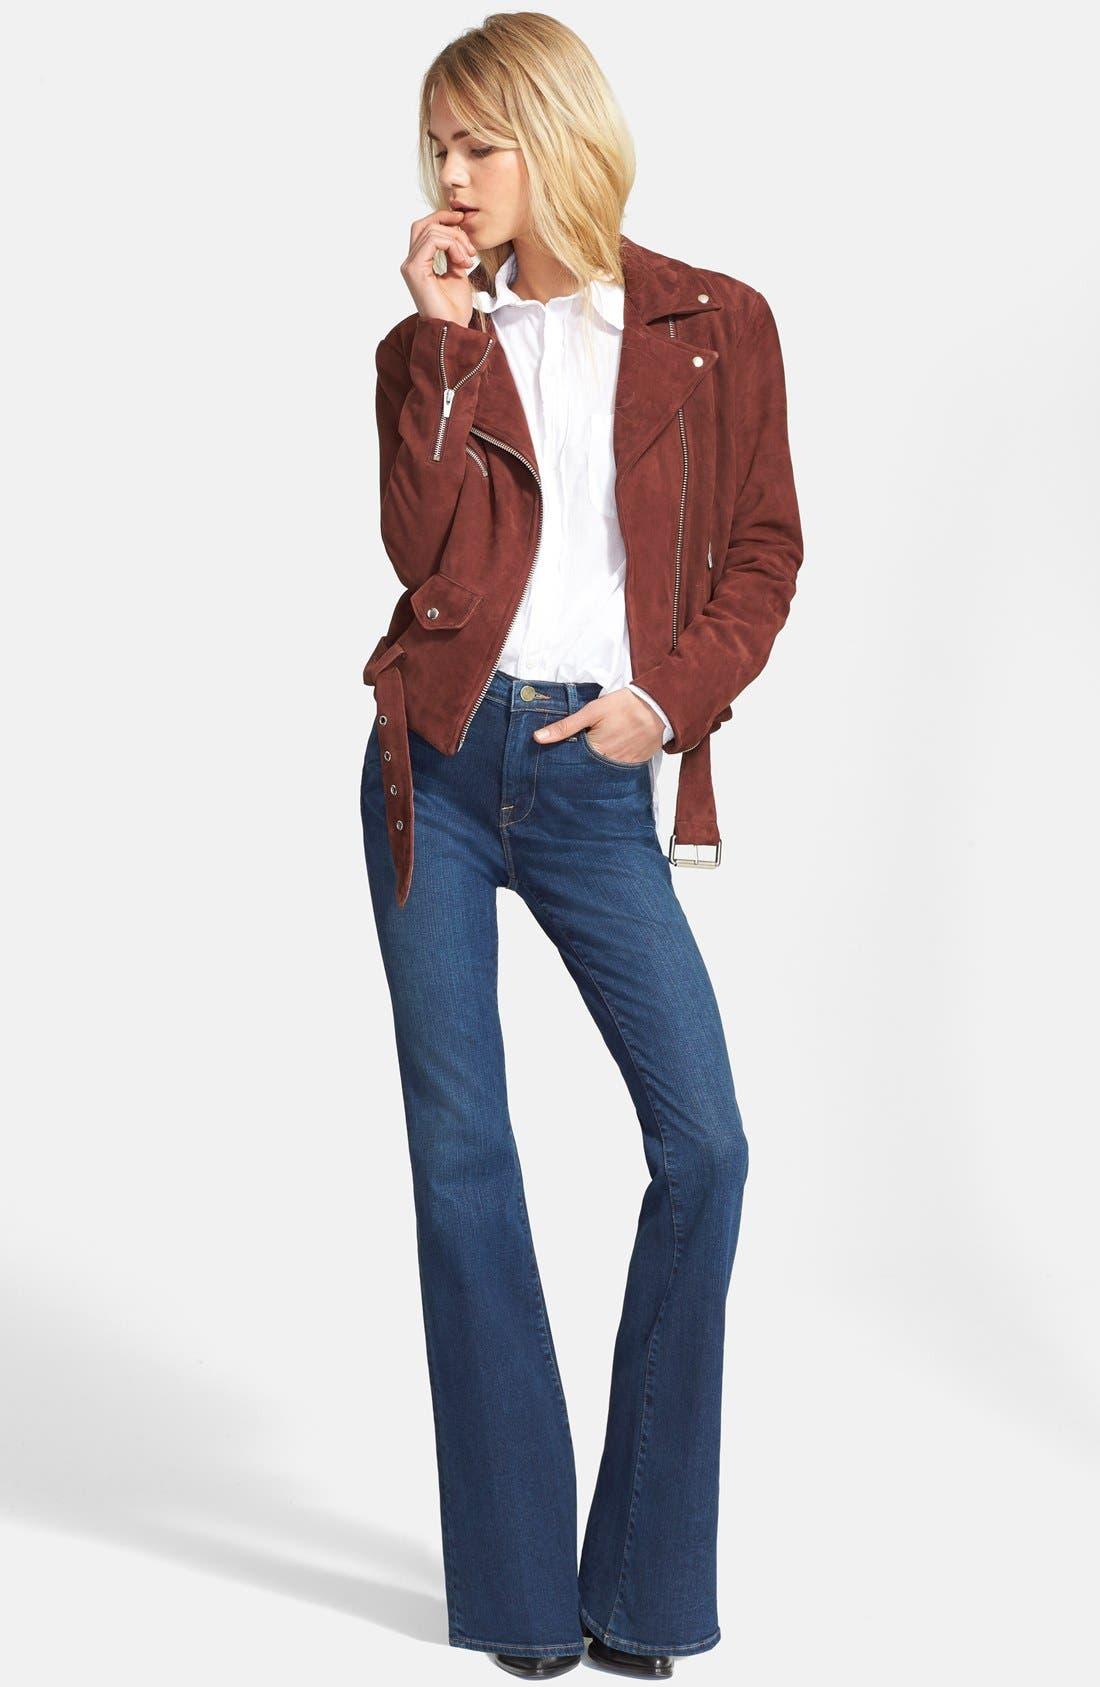 FRAME, Denim 'Le High Flare' Flare Leg Jeans, Alternate thumbnail 5, color, 401